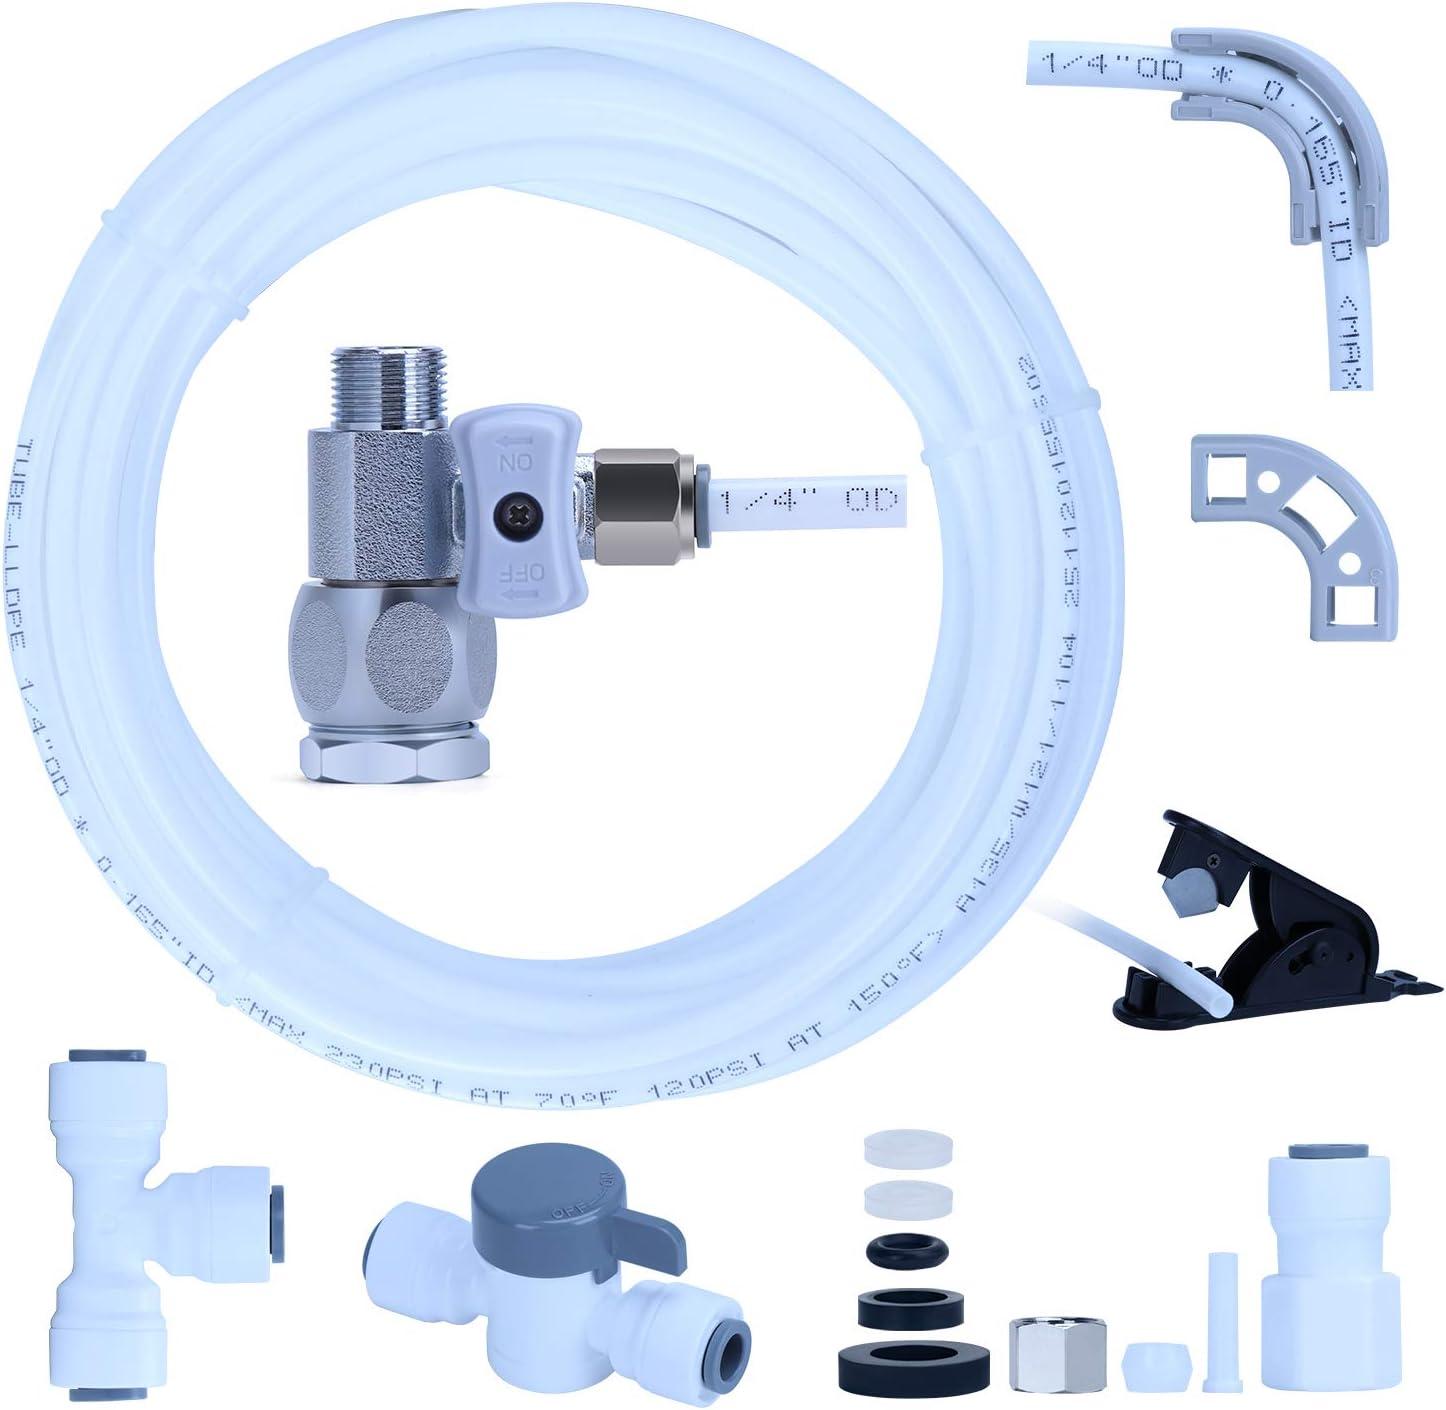 YUHX Water Filtration Ice Maker Fridge Installation Kit with Shut-Off T Valve,1/4